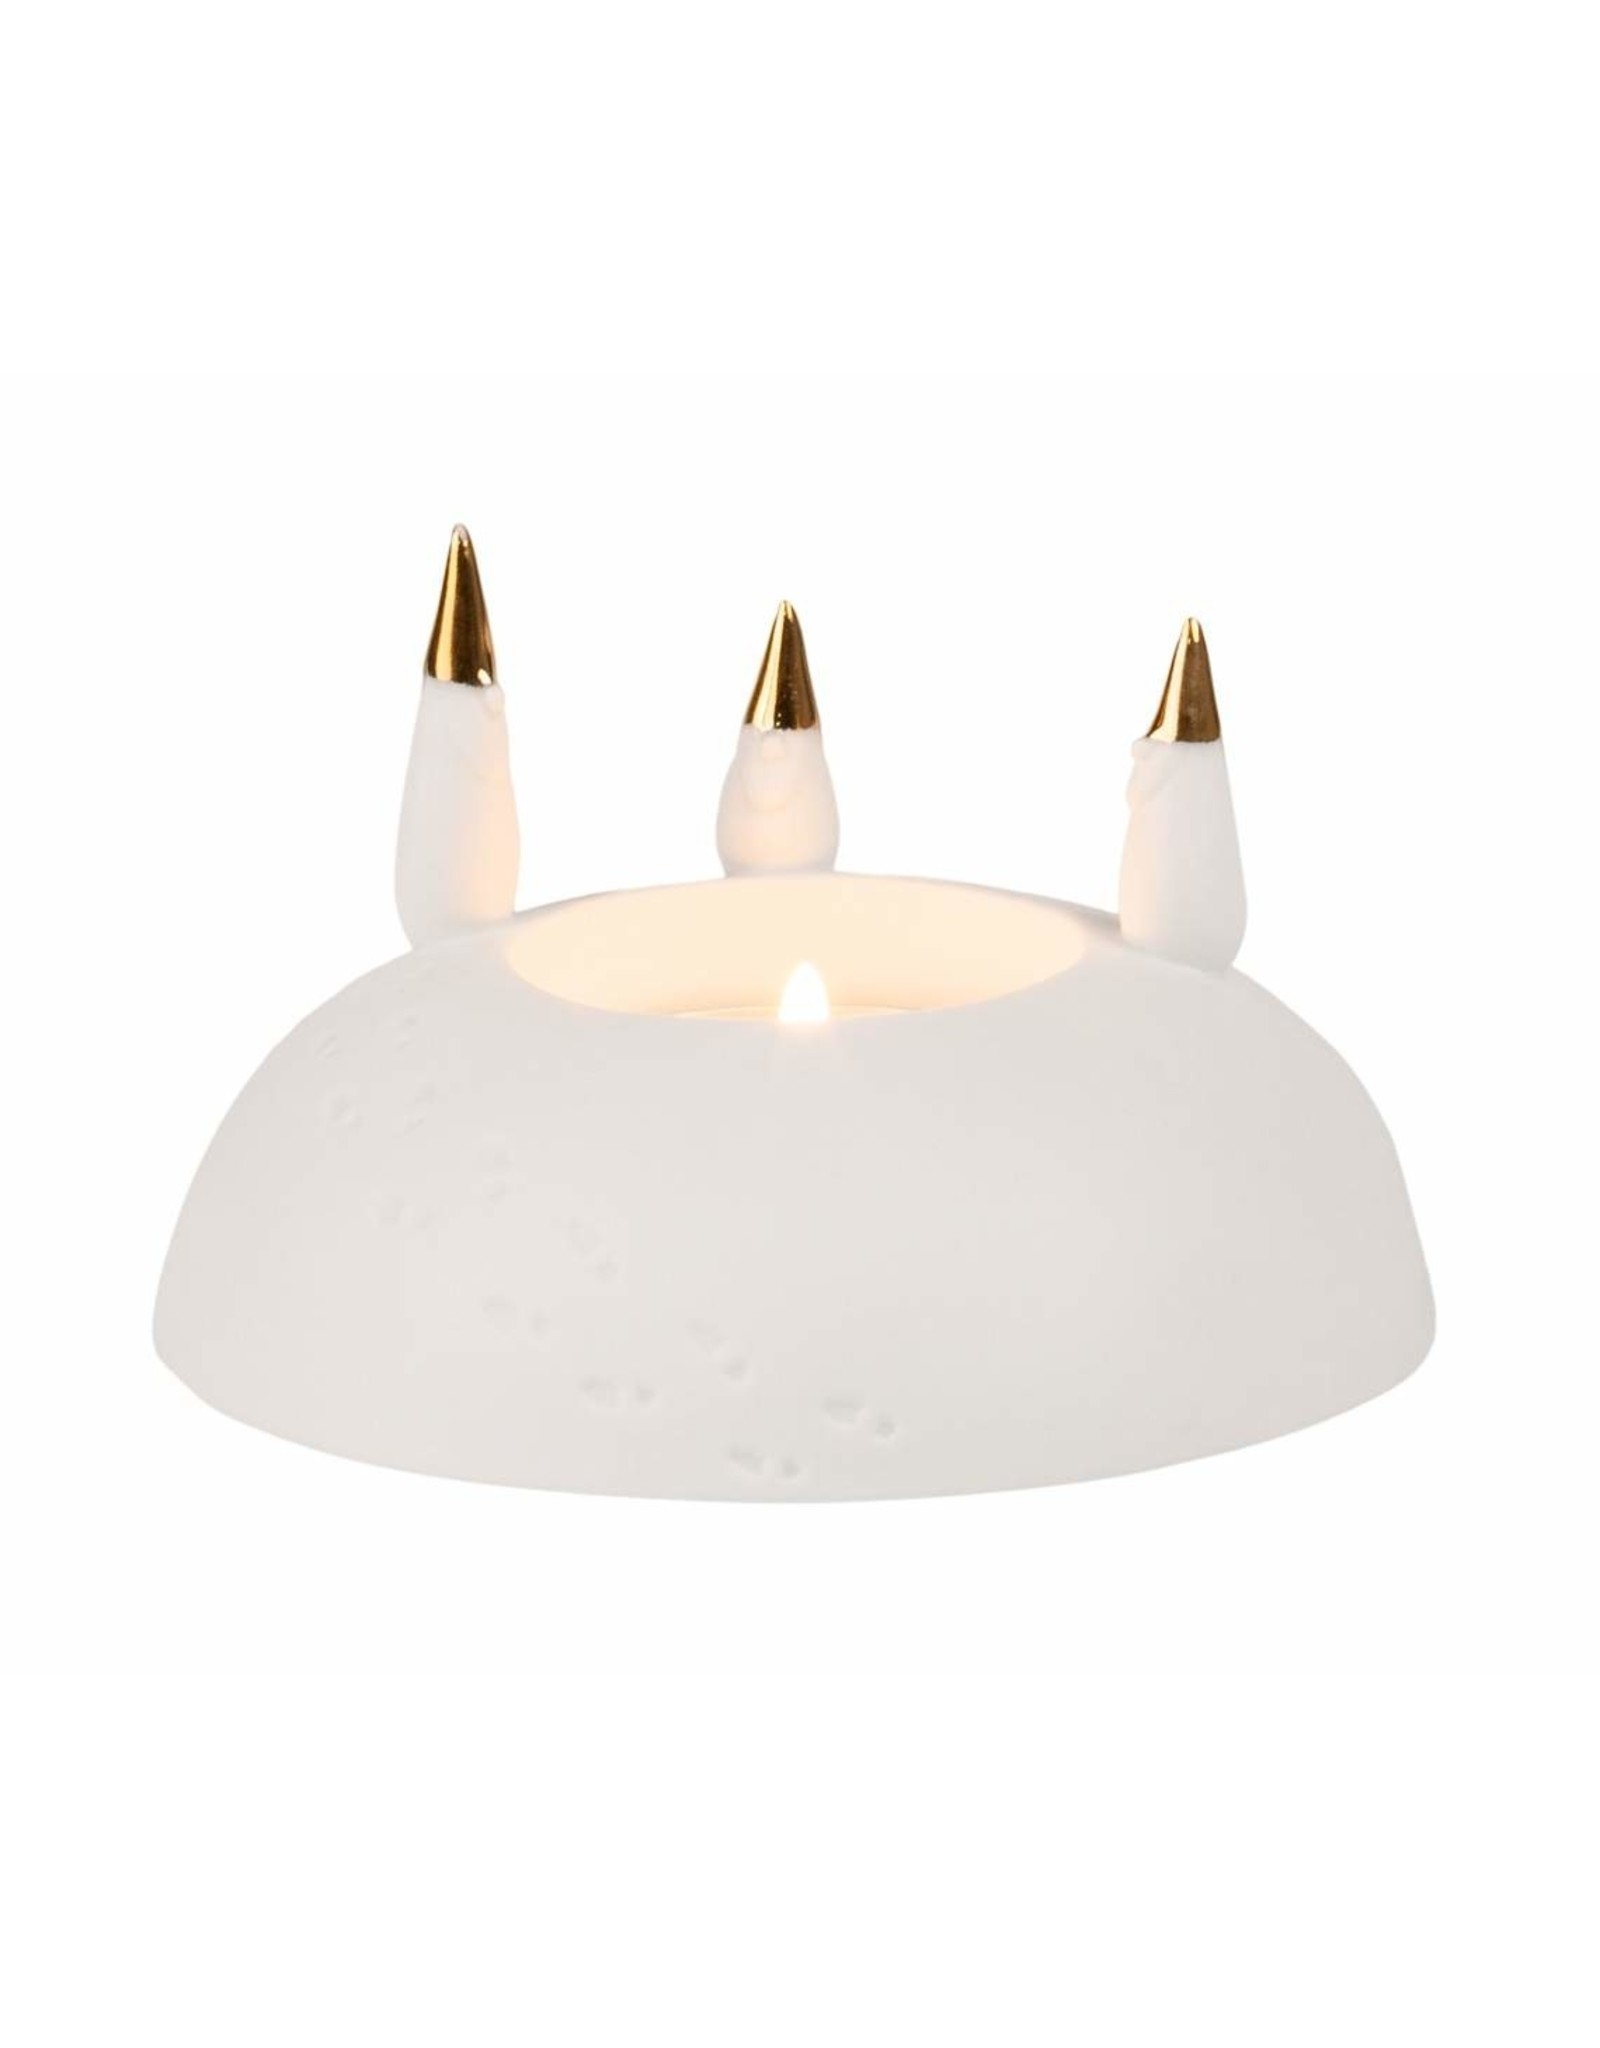 Raeder Waxinelicht kerstman wit/goud d:10 H:6cm